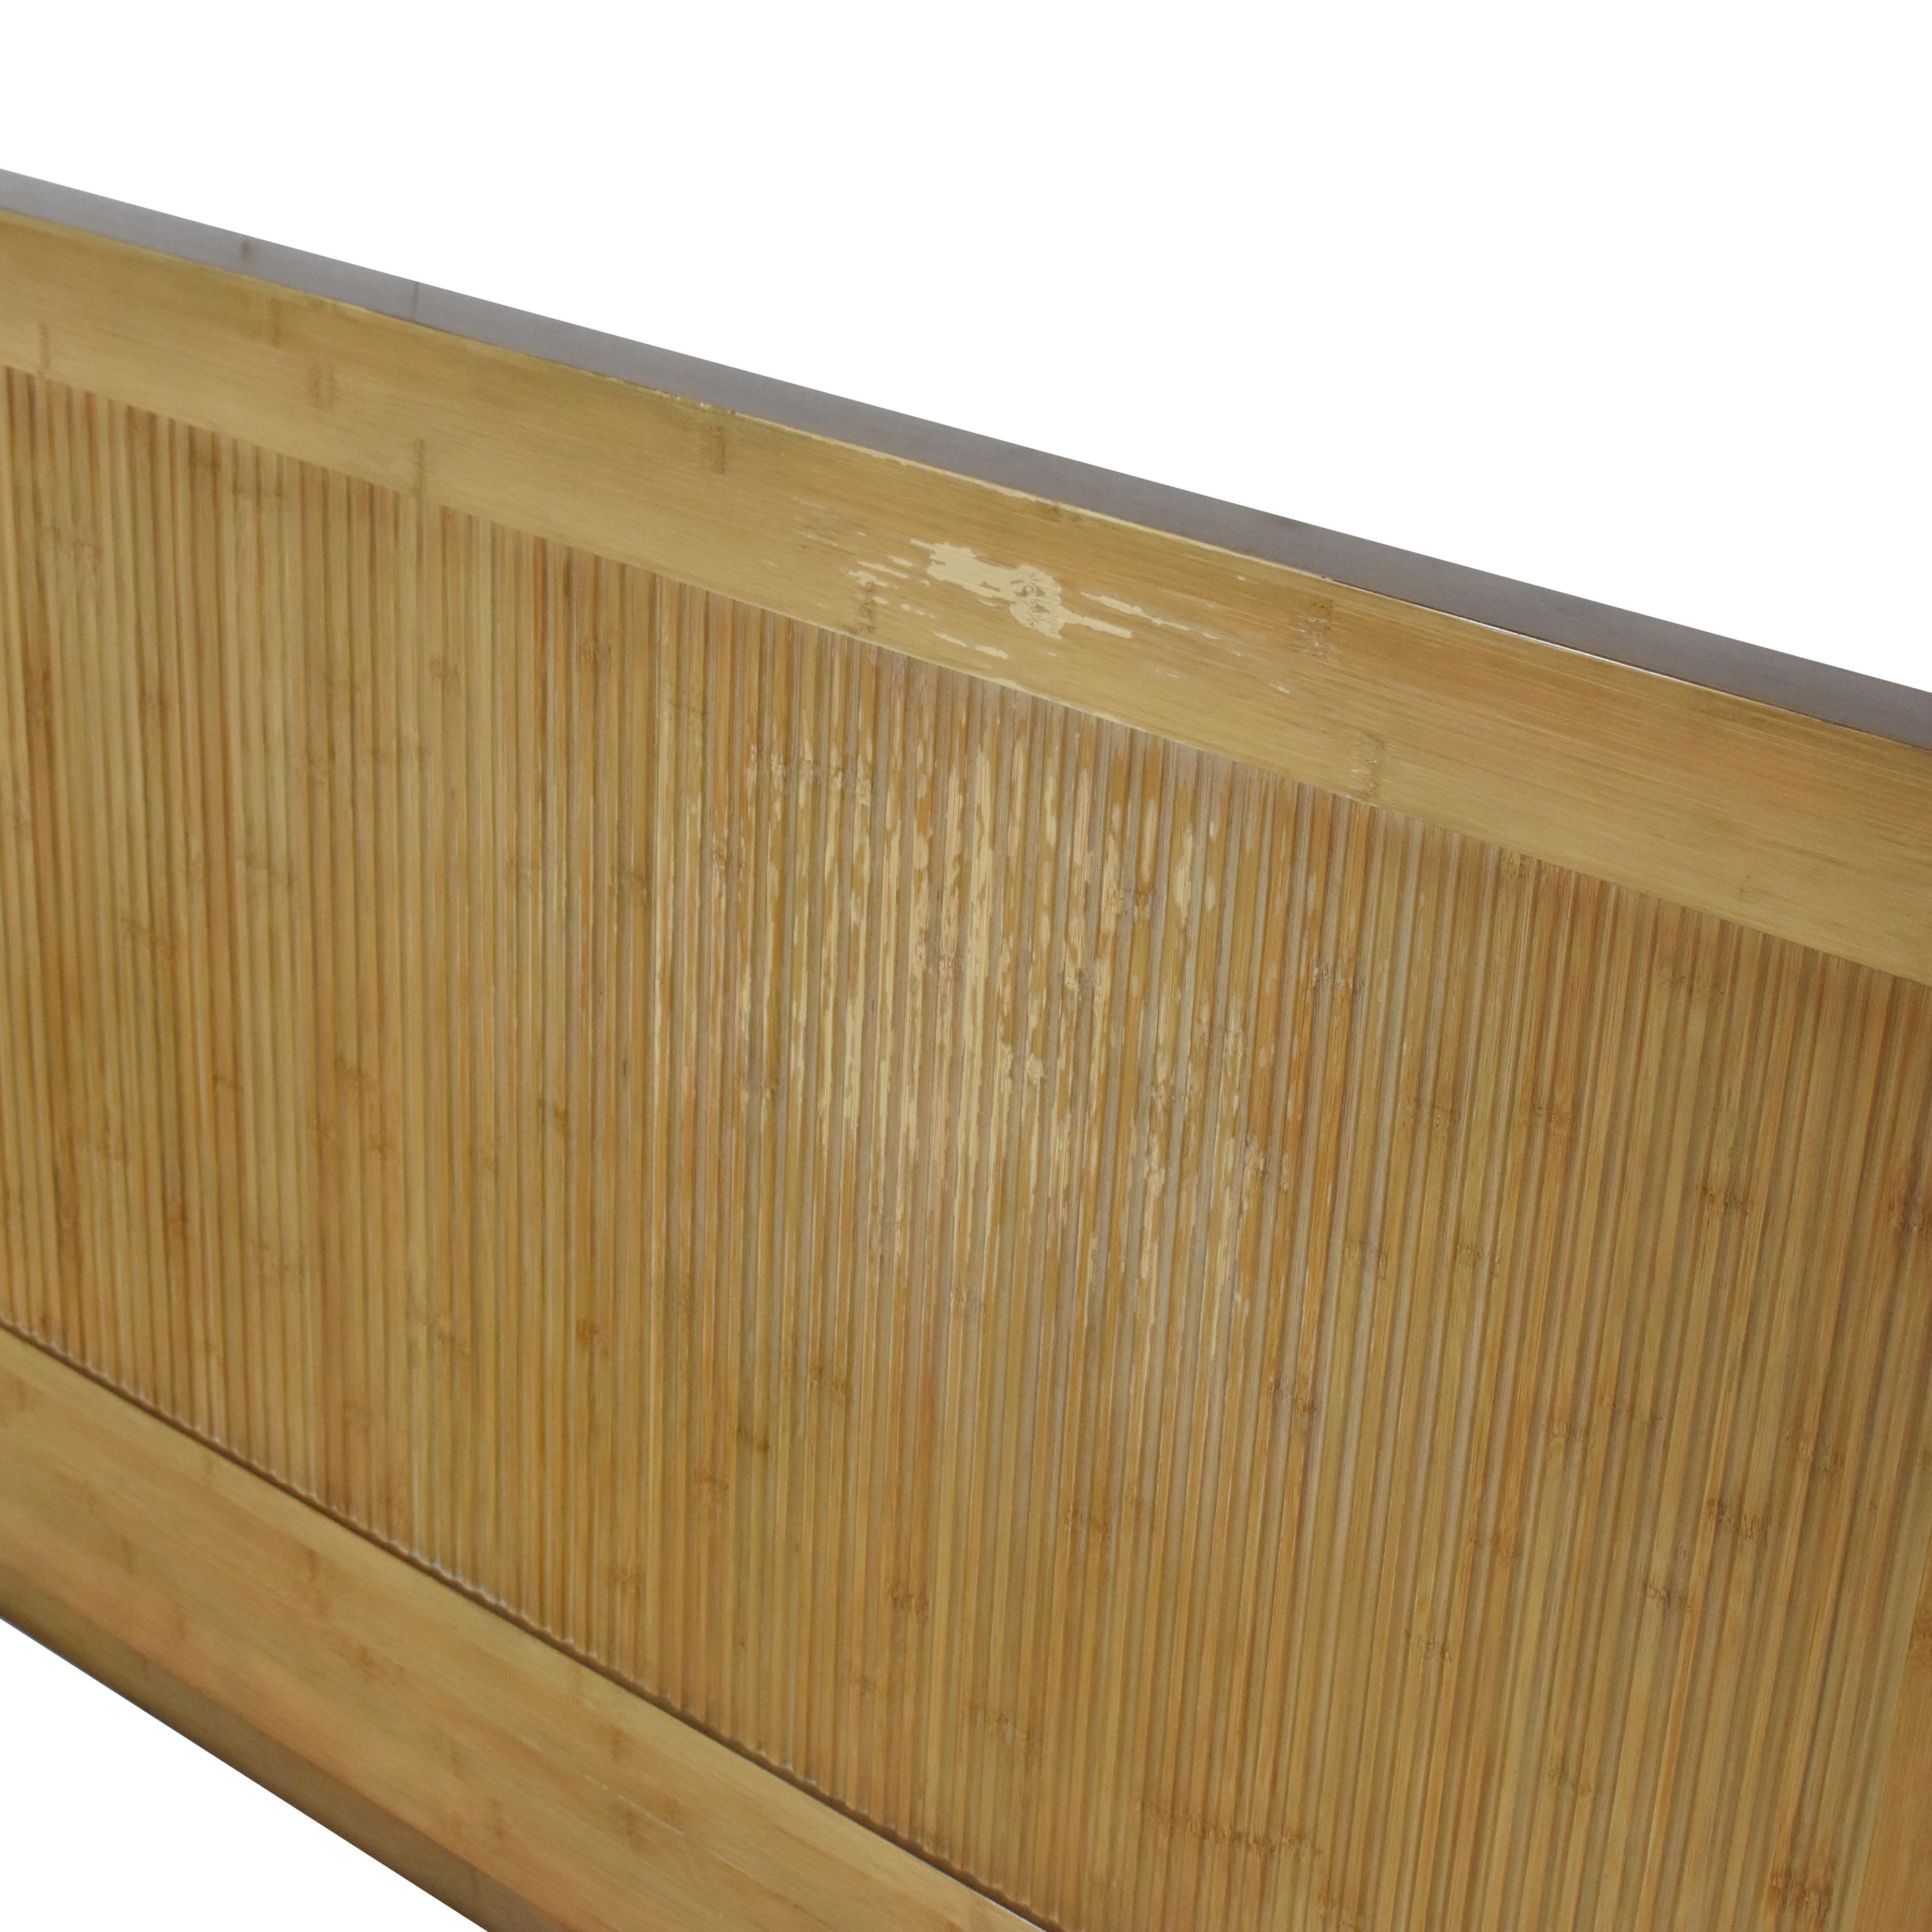 Room & Board Room & Board Queen Bamboo Timbre Maria Yee Platform Bed ma